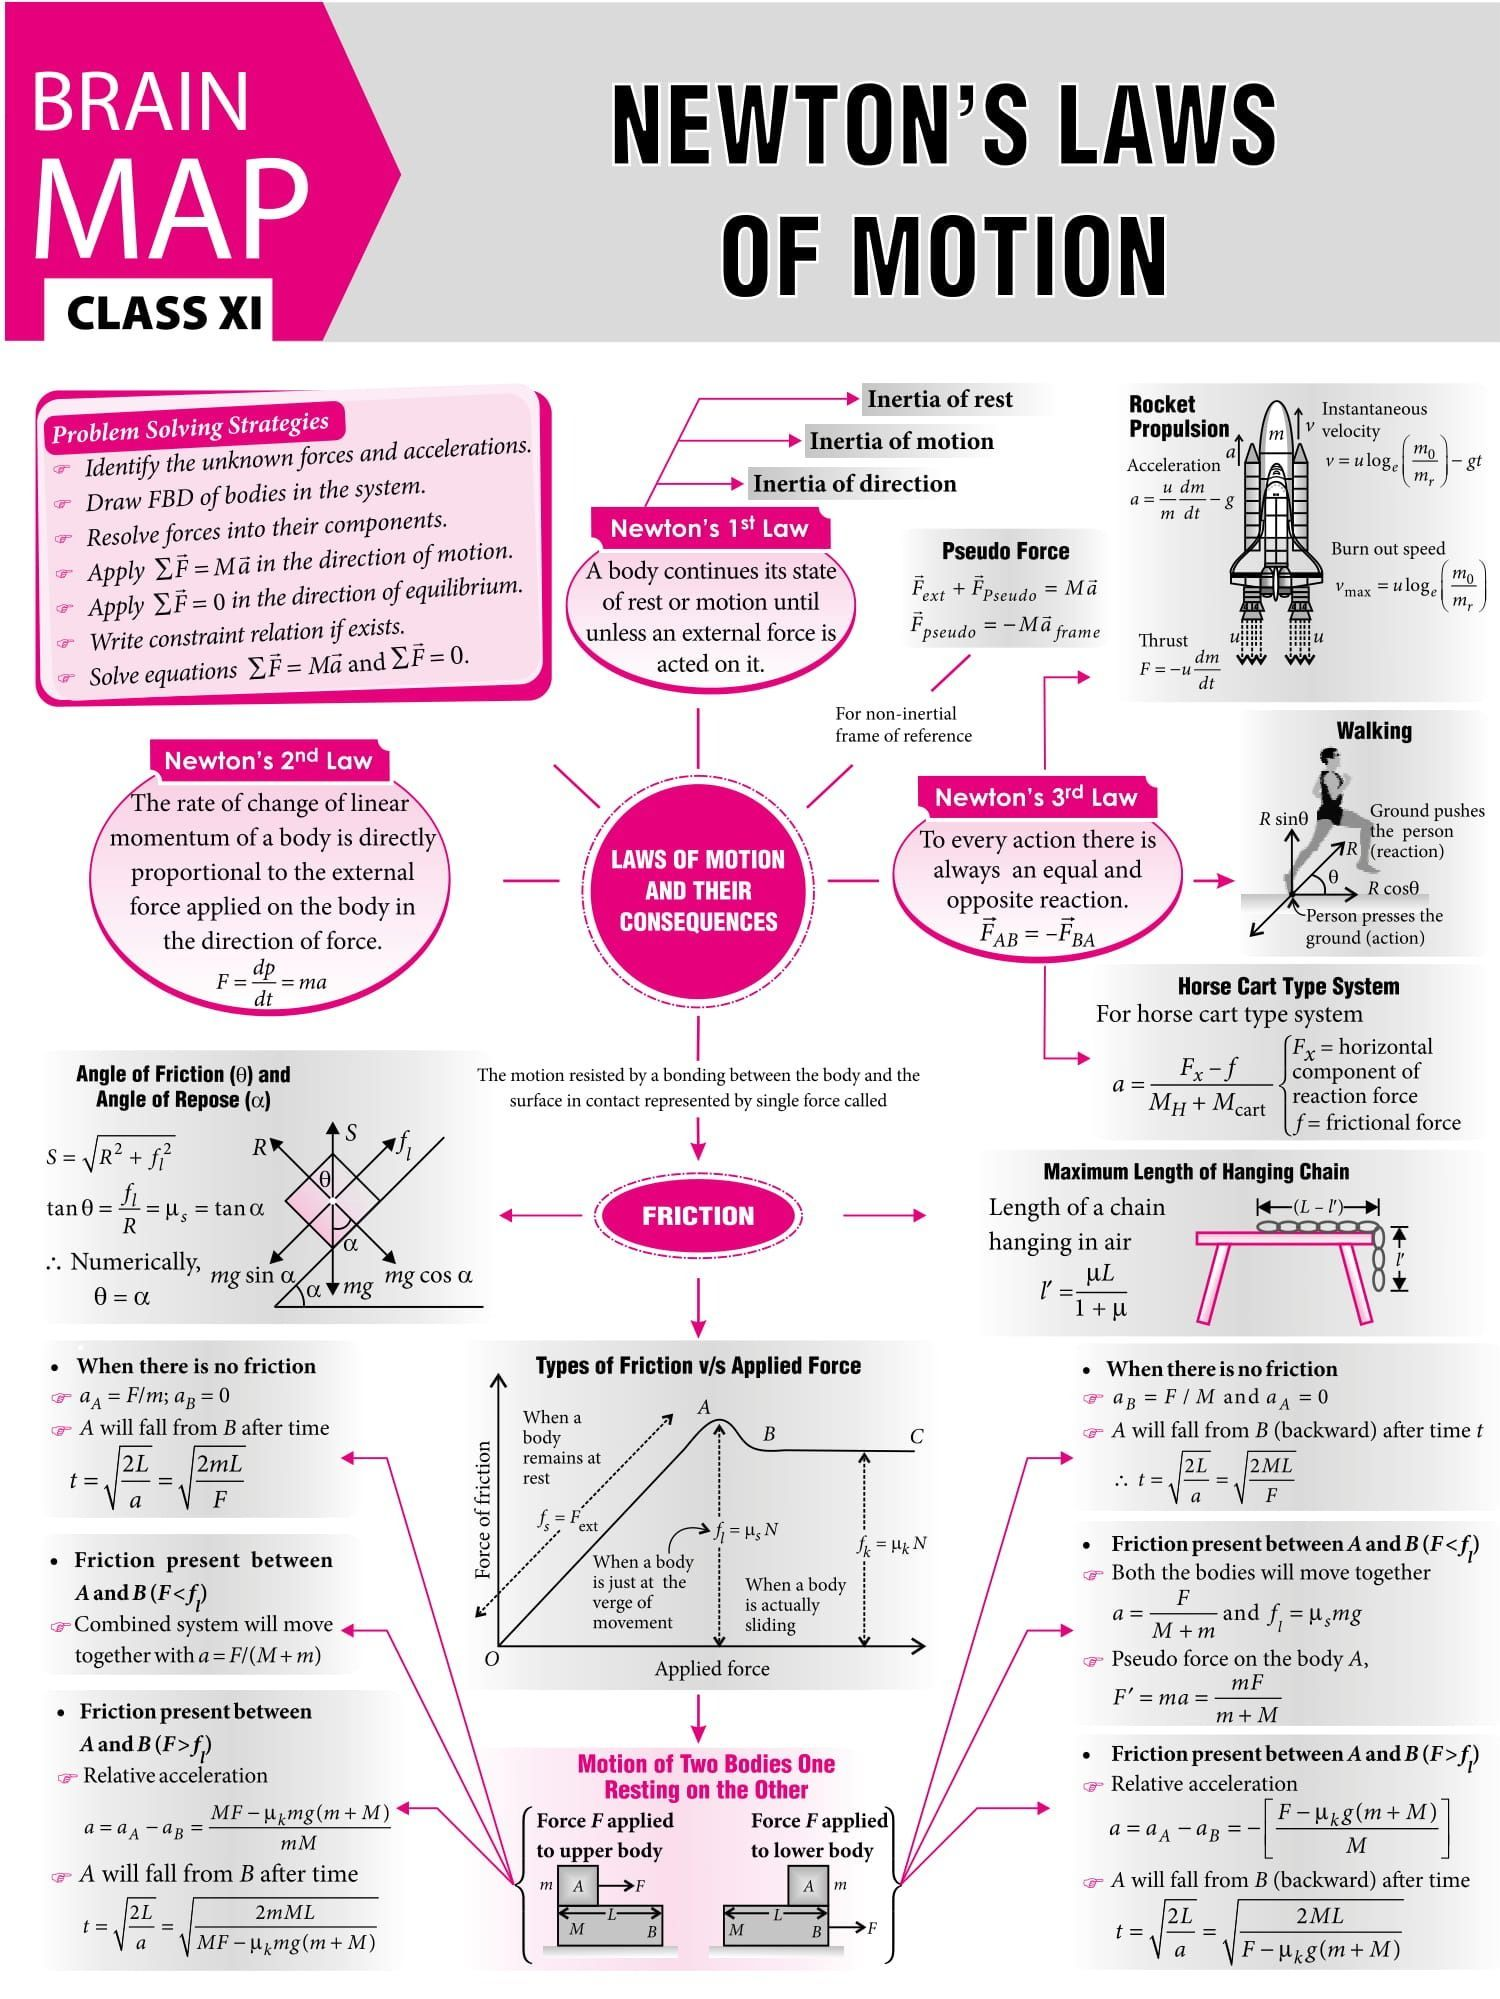 Jeeadvanced Newton S Classxii Magazine Concept Class12 Classxi Class11 Jeemain Physics Motion Laws You Mtg Physics Concepts Basic Physics Physics Formulas